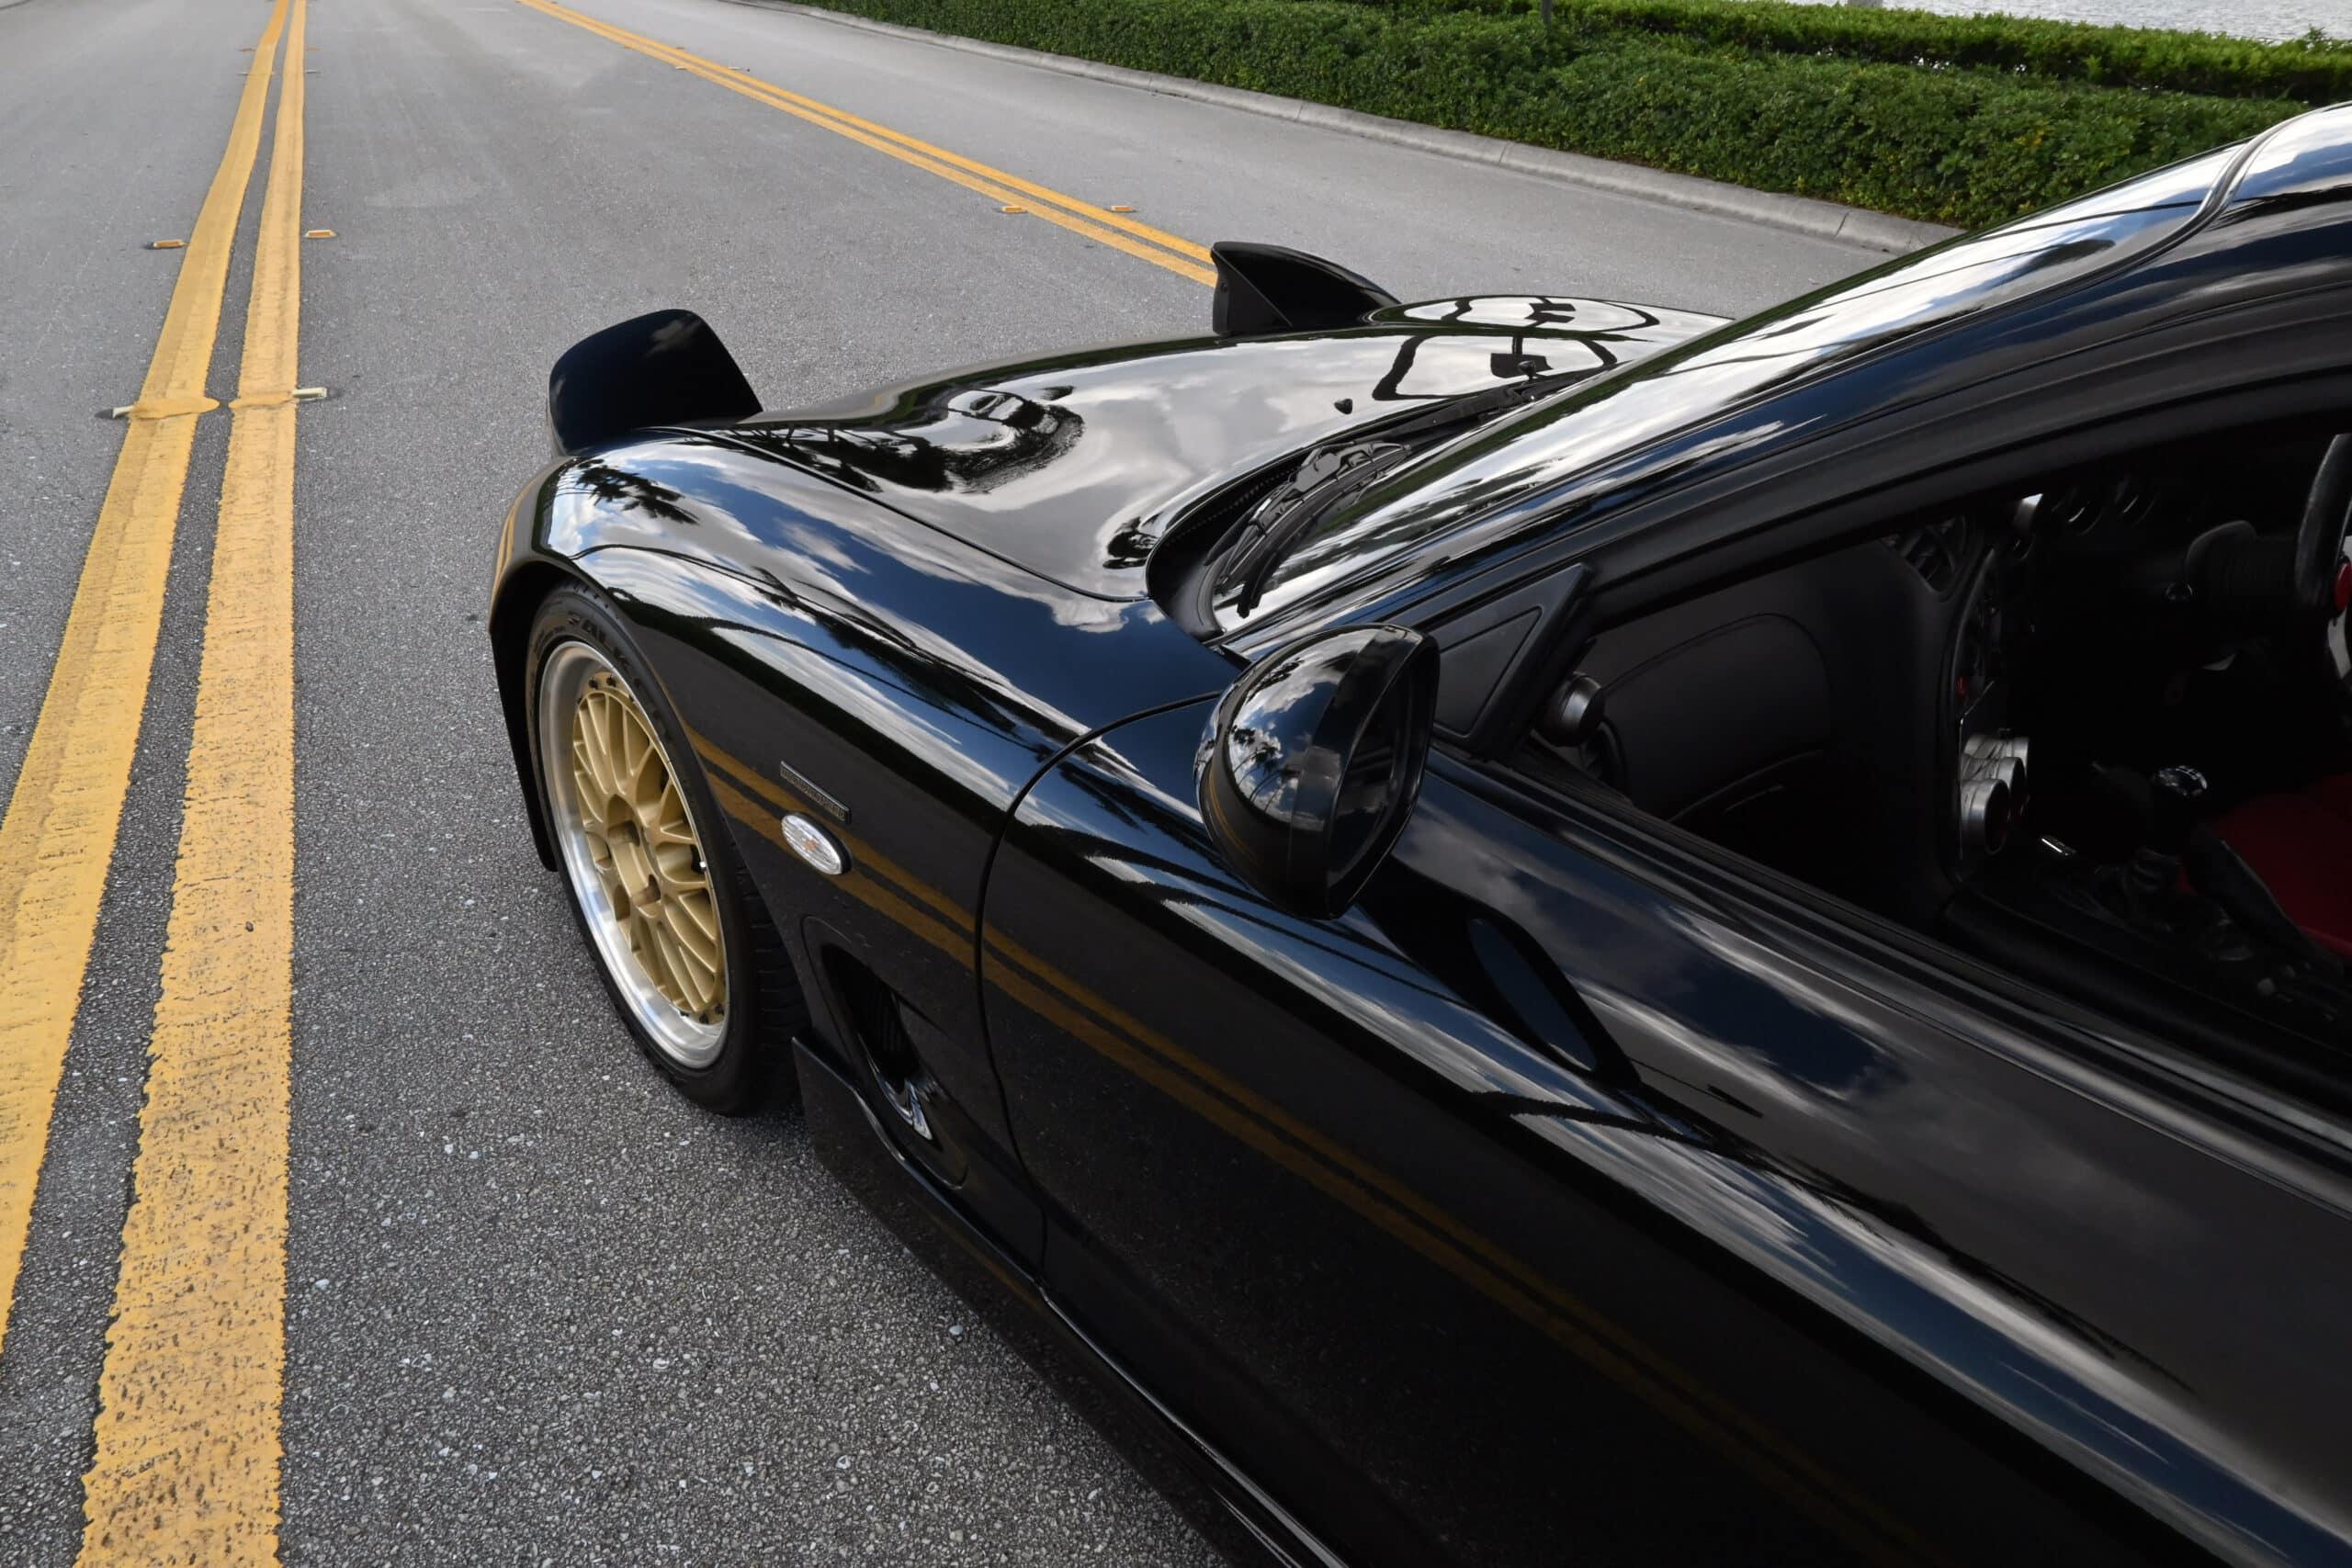 1995 RX7 FD3s Efini Bathurst X OEM+ 62K kilometers – 38k miles   1 of only 777 produced